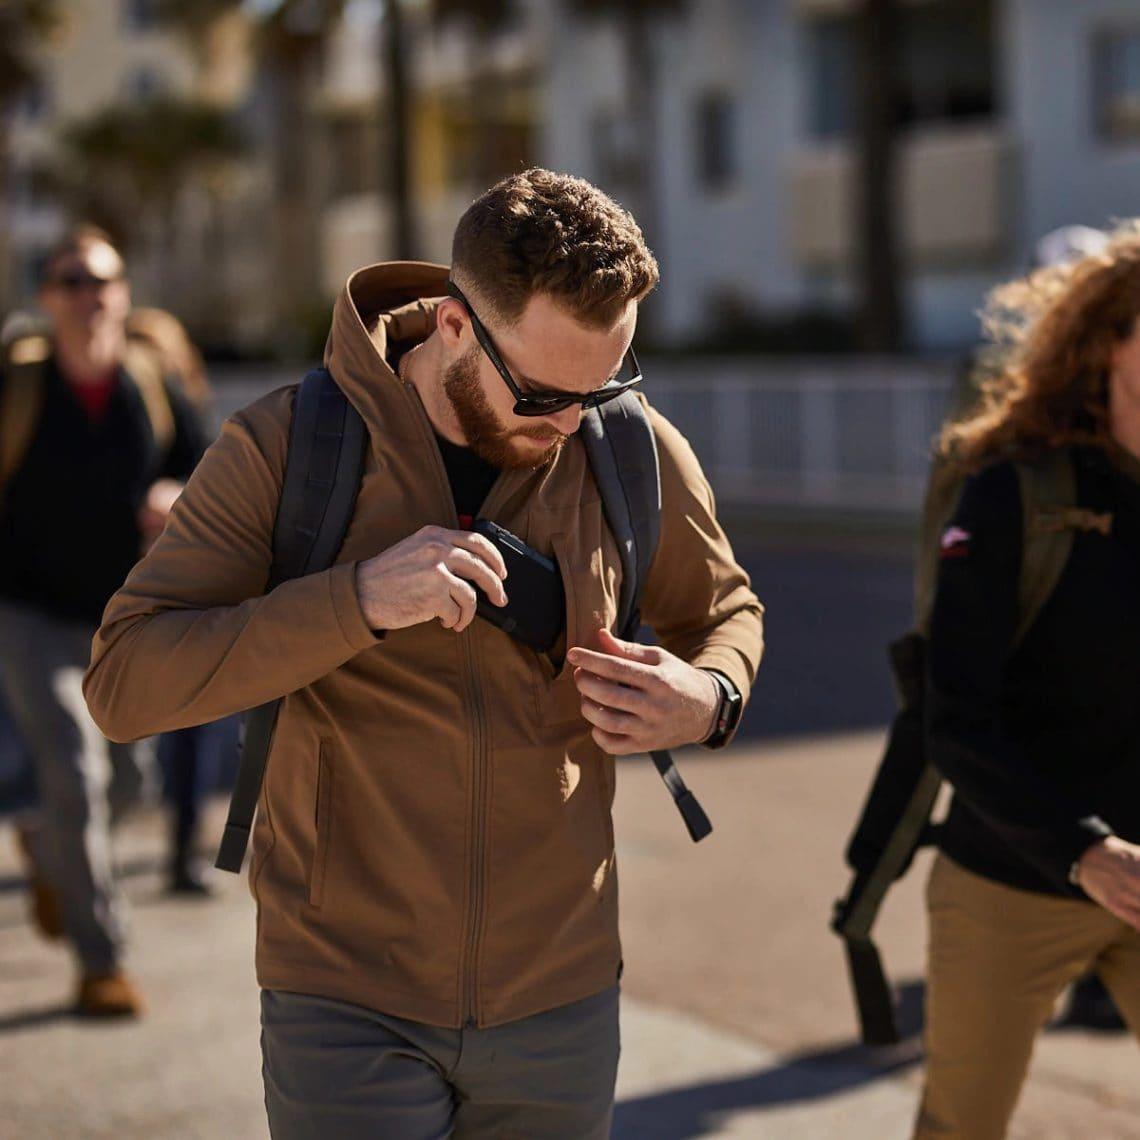 GORUCK Challenge Windbreaker (Coyote) with phone